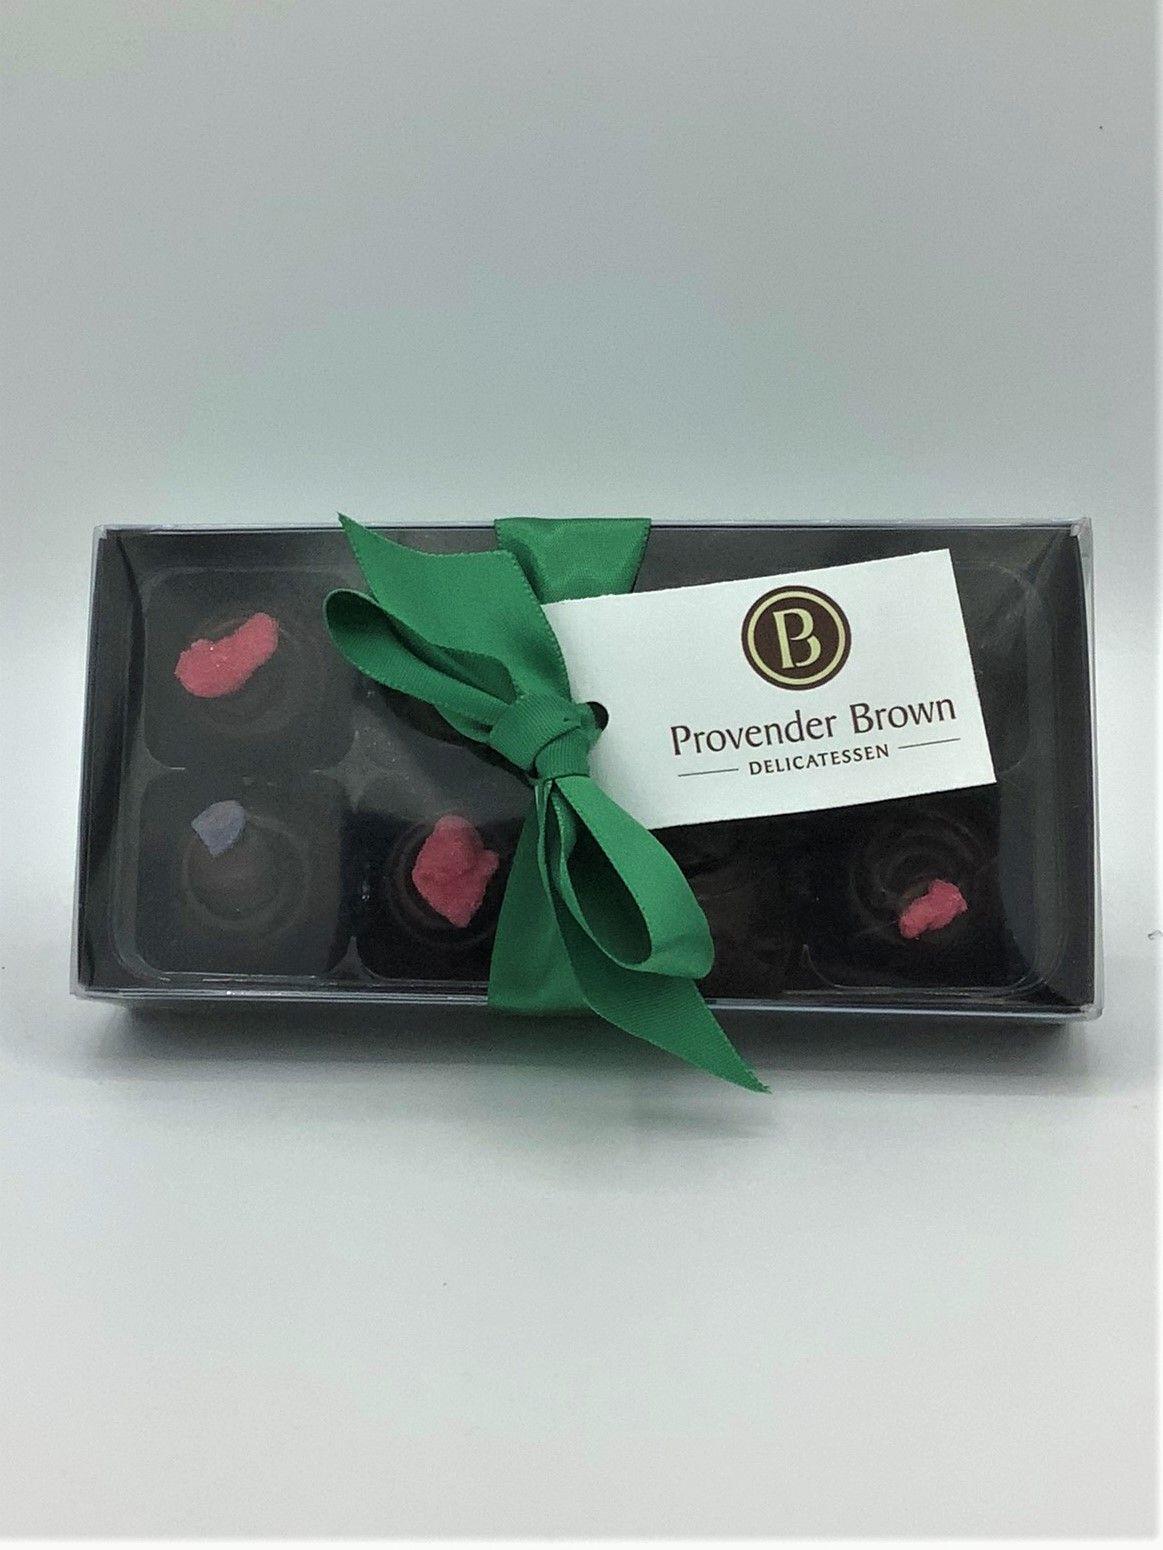 Provender Brown Violet & Rose Creams Gifting Chocolates